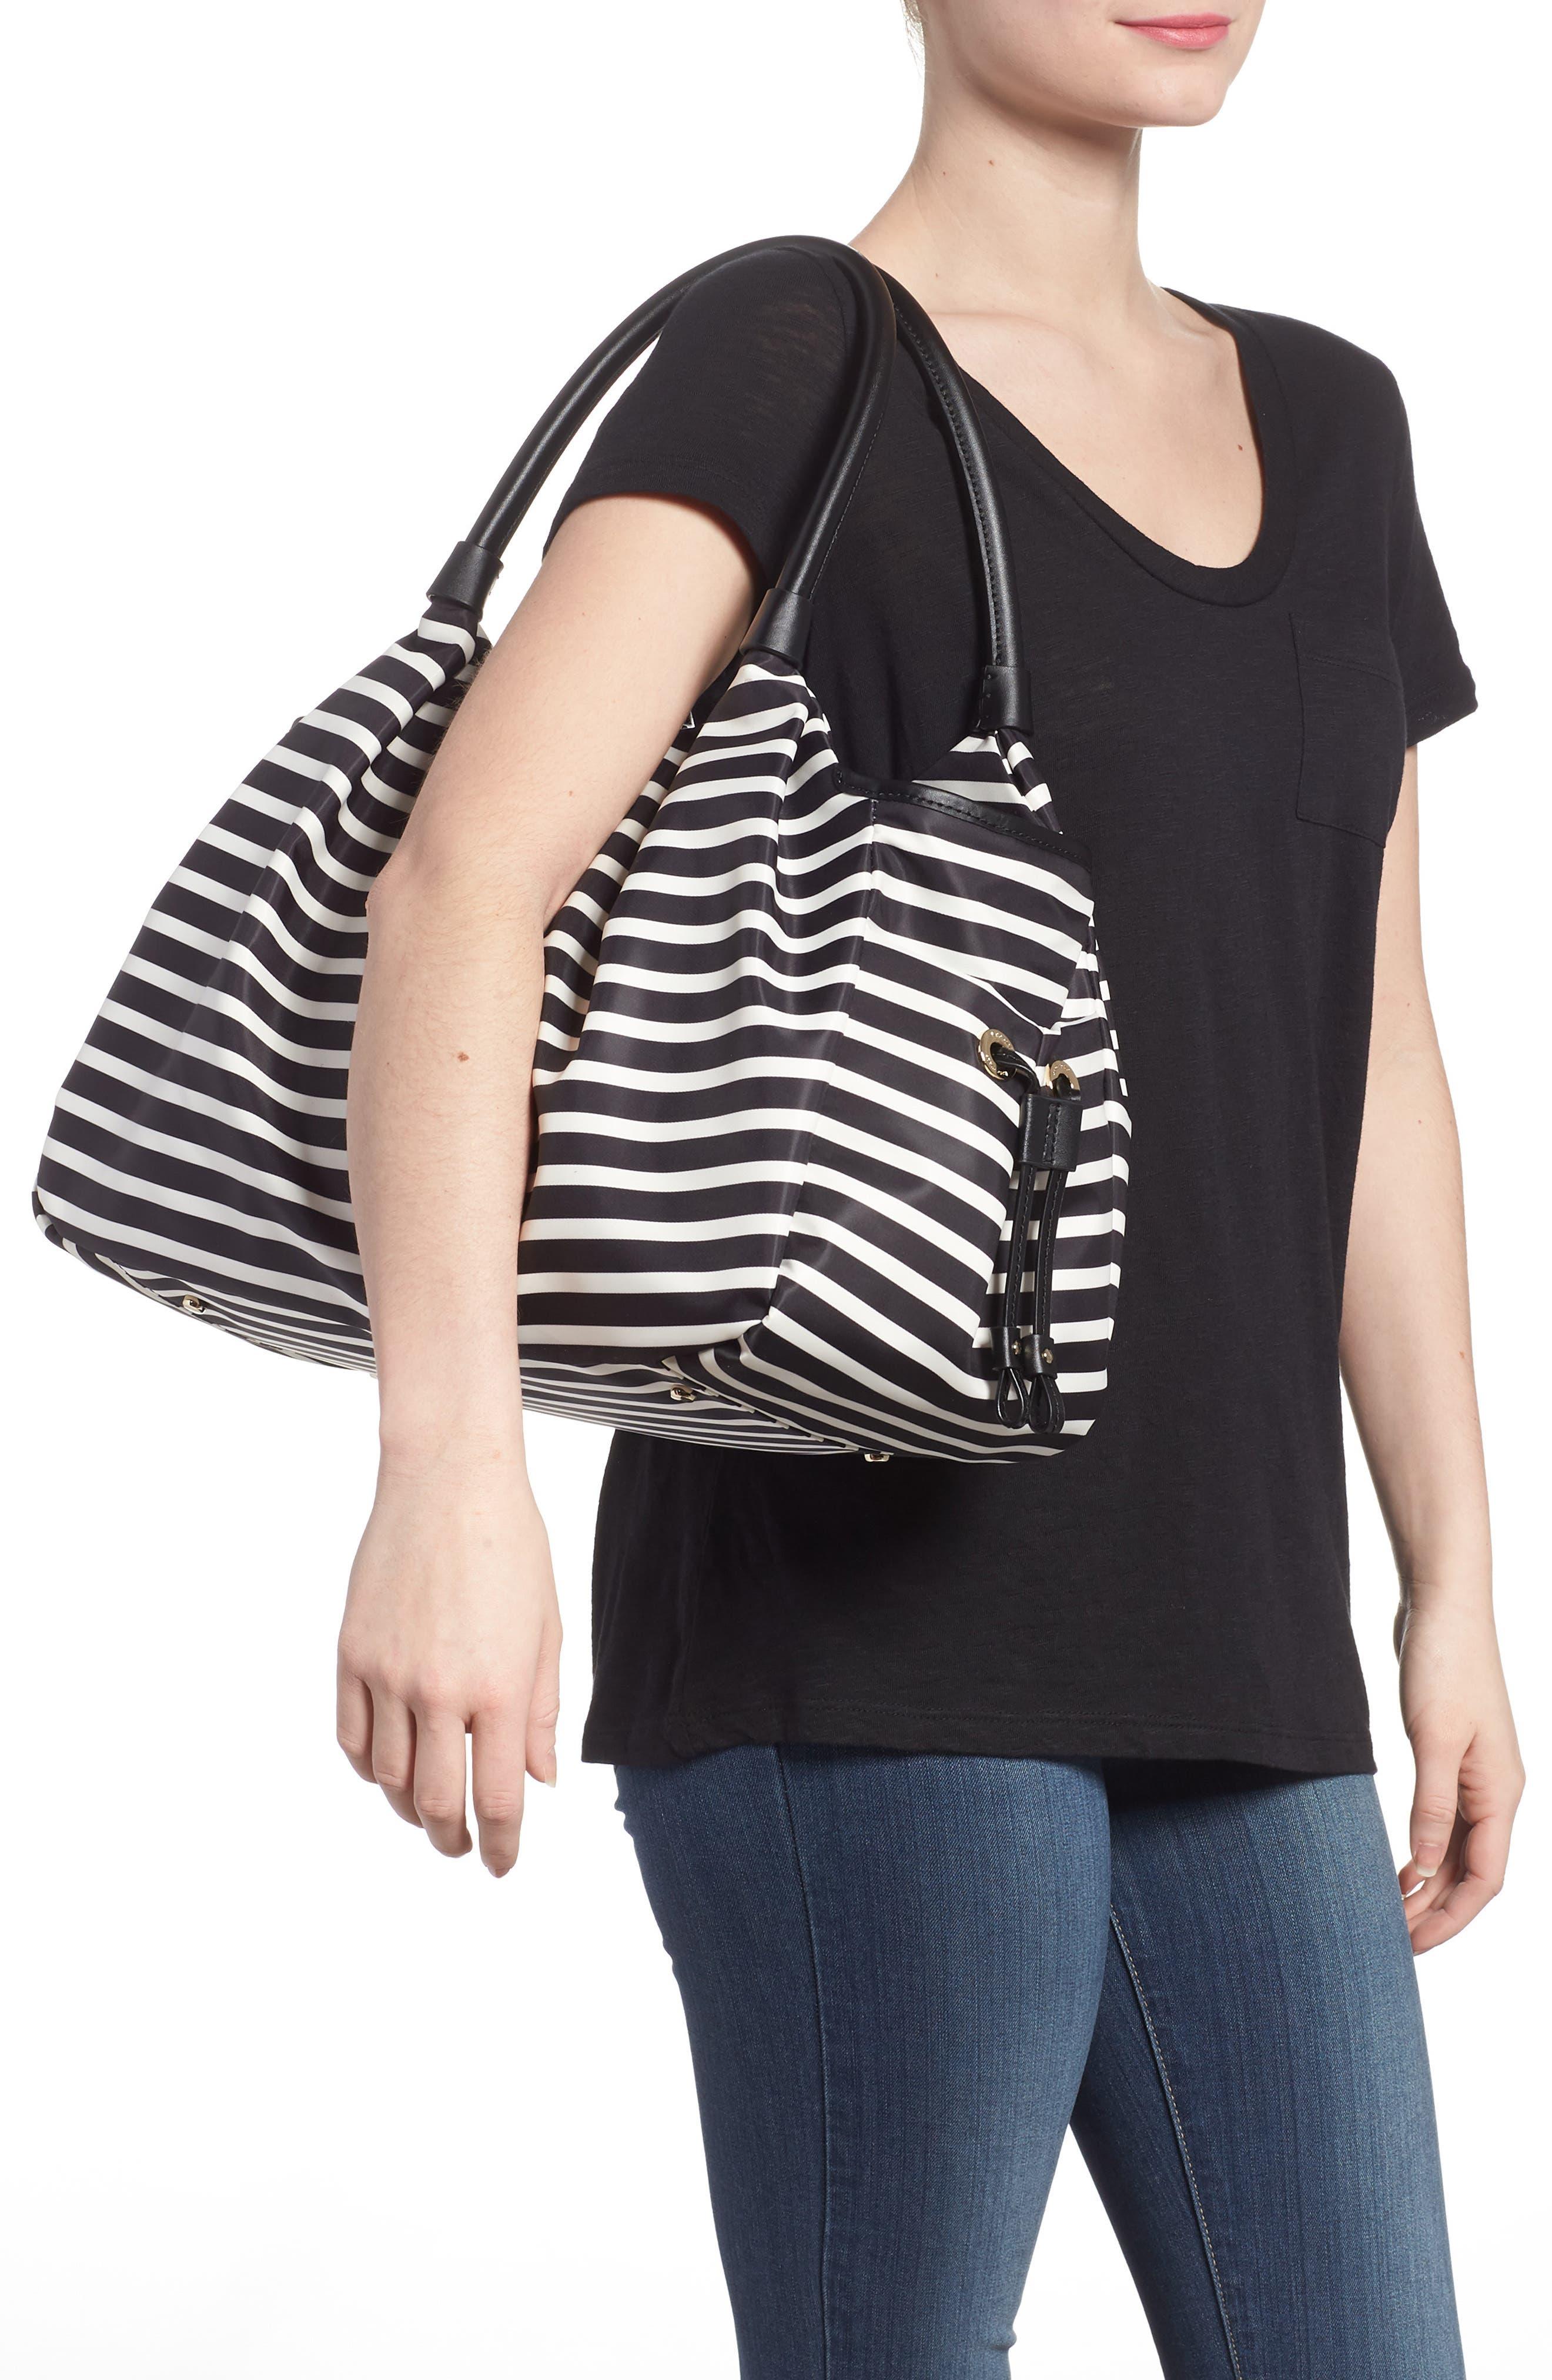 watson lane - stevie diaper bag,                             Alternate thumbnail 2, color,                             BLACK/ CLOTTED CREAM